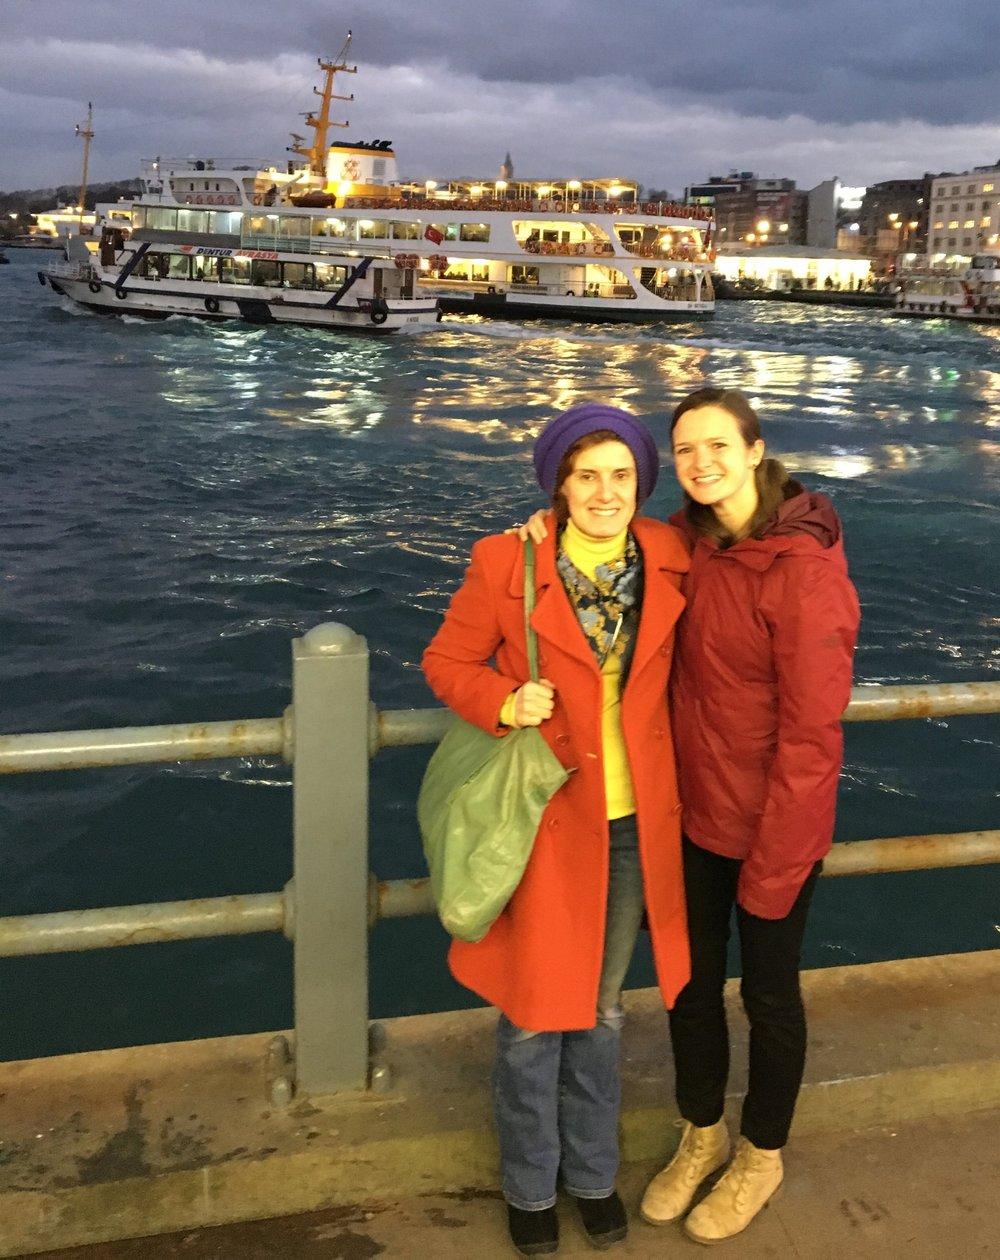 ASPIRE's Filiz Katibe Şaşaoğluand Melissa Meinhart during their visit to Istanbul in January 2018.